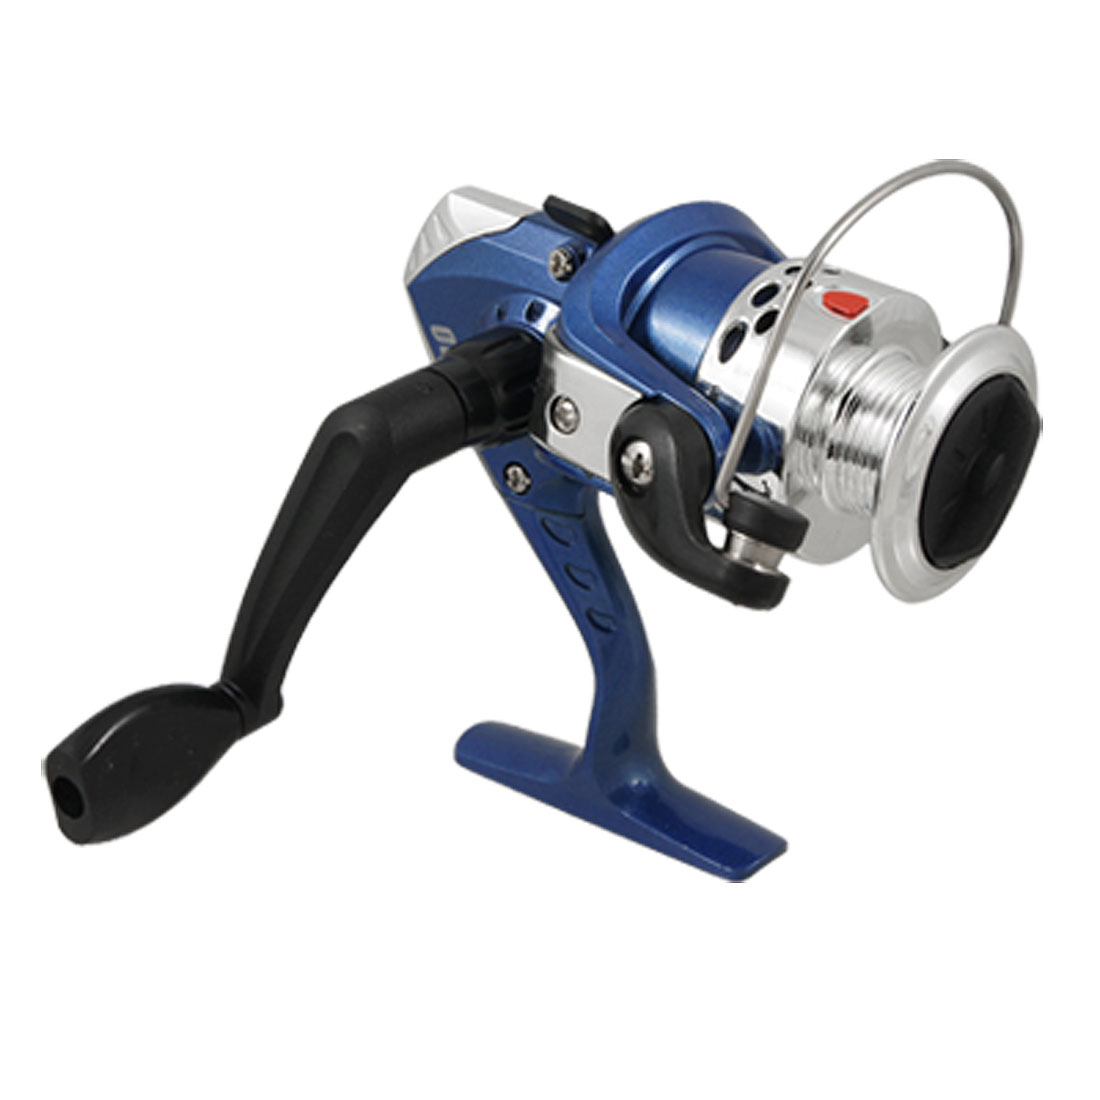 Black Plastic Handle Fishing Spinning Bearings Line Spool 5.2:1 Gear Ratio